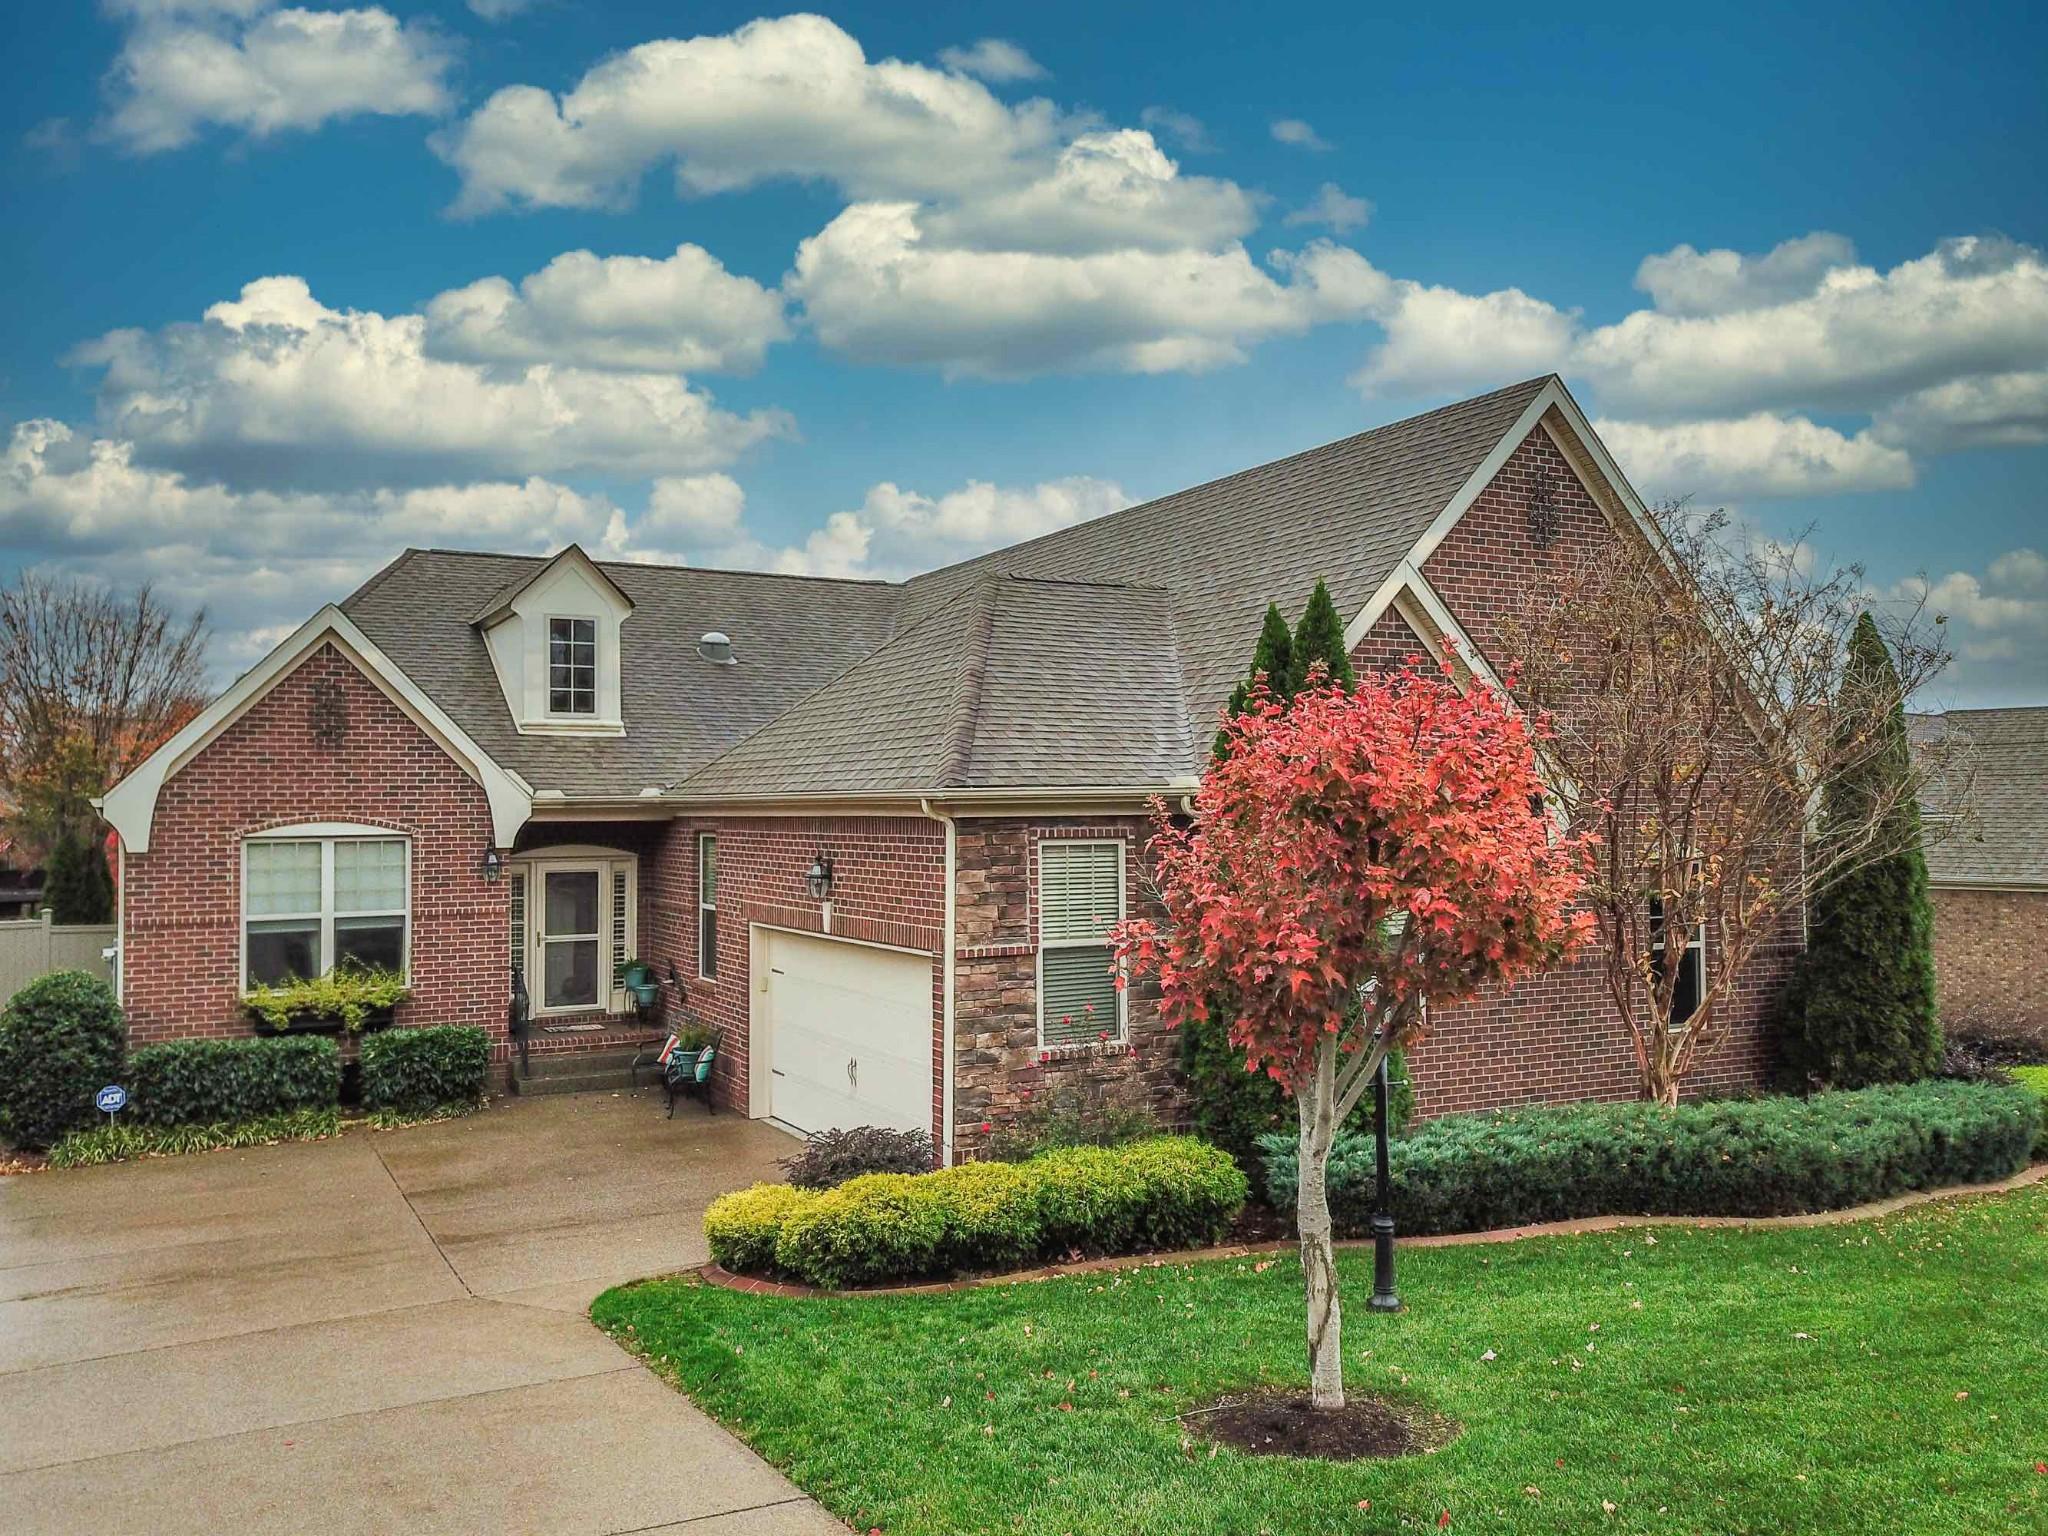 169 Cobbler Cir Property Photo - Hendersonville, TN real estate listing